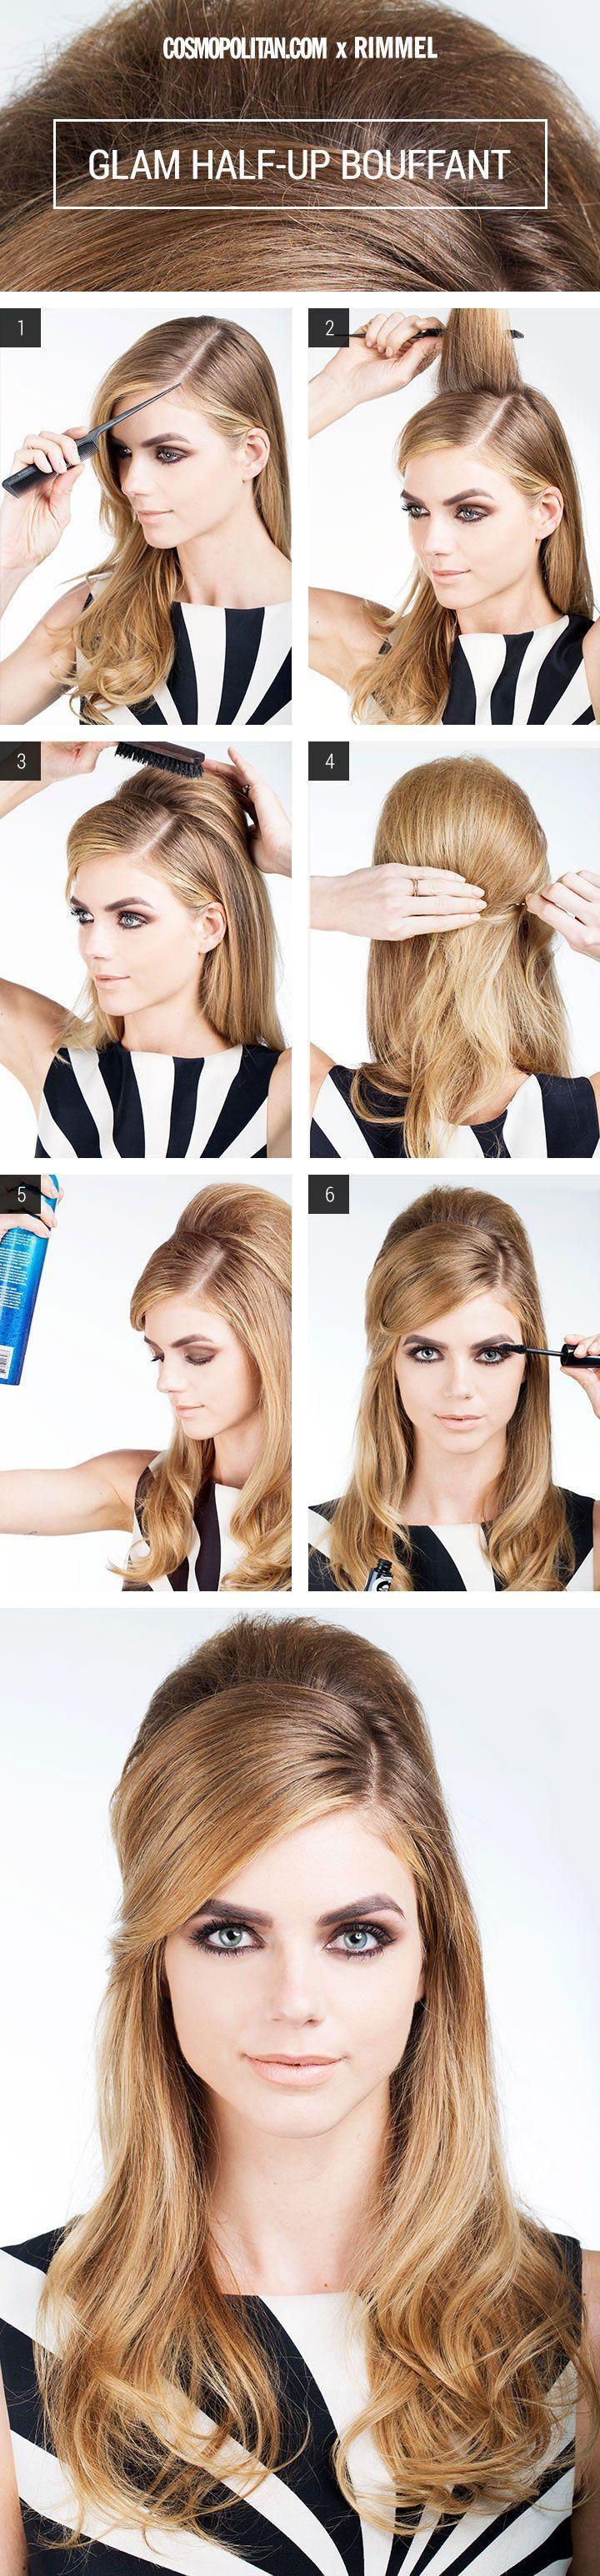 Hair How To Glam Half Up Bouffant Hair Romance Bouffant Hair Hair Styles